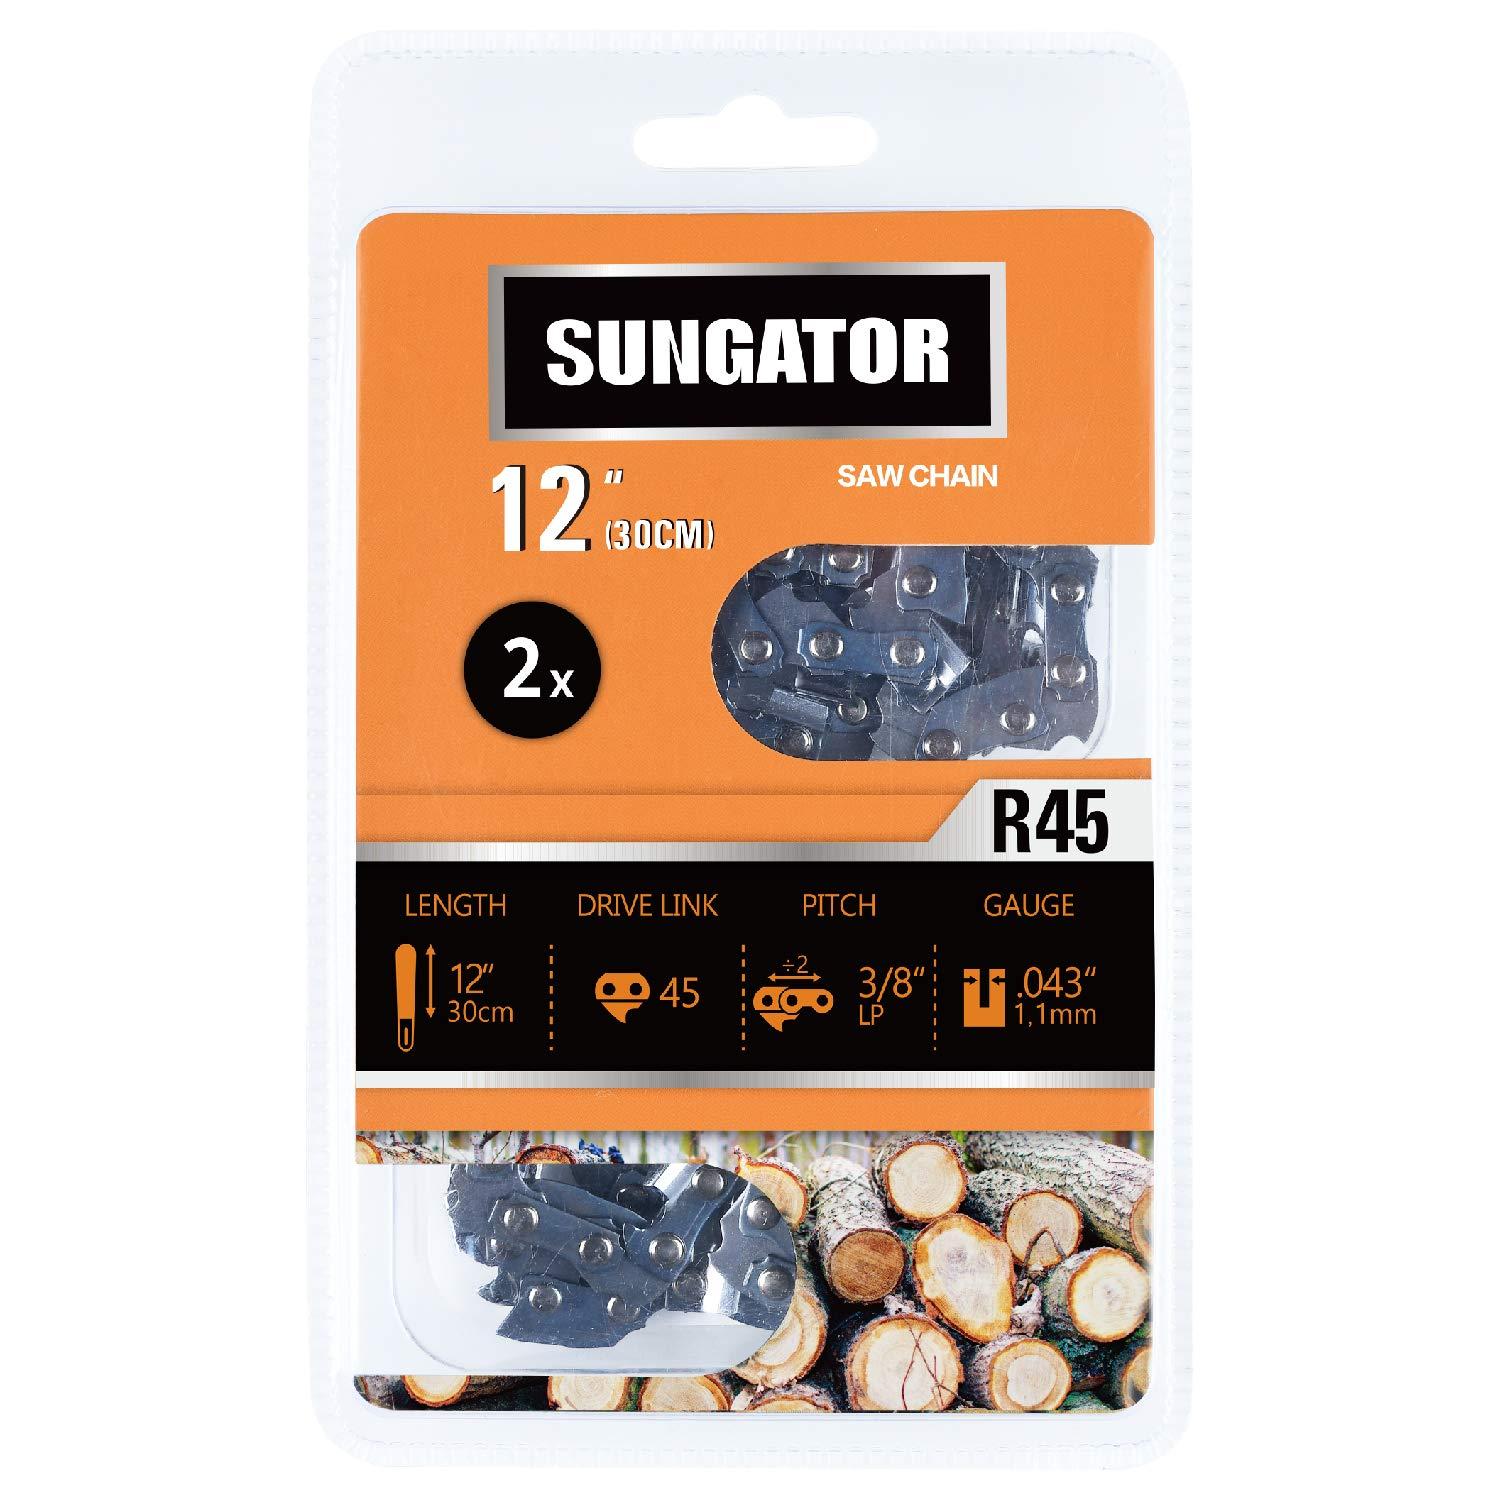 SUNGATOR 2-Pack 12 Inch Chainsaw Chain SG-R45, 3/8'' LP Pitch - .043'' Gauge - 45 Drive Links, Fits Craftsman, Husqvarna, Ryobi, Dewalt by SUNGATOR